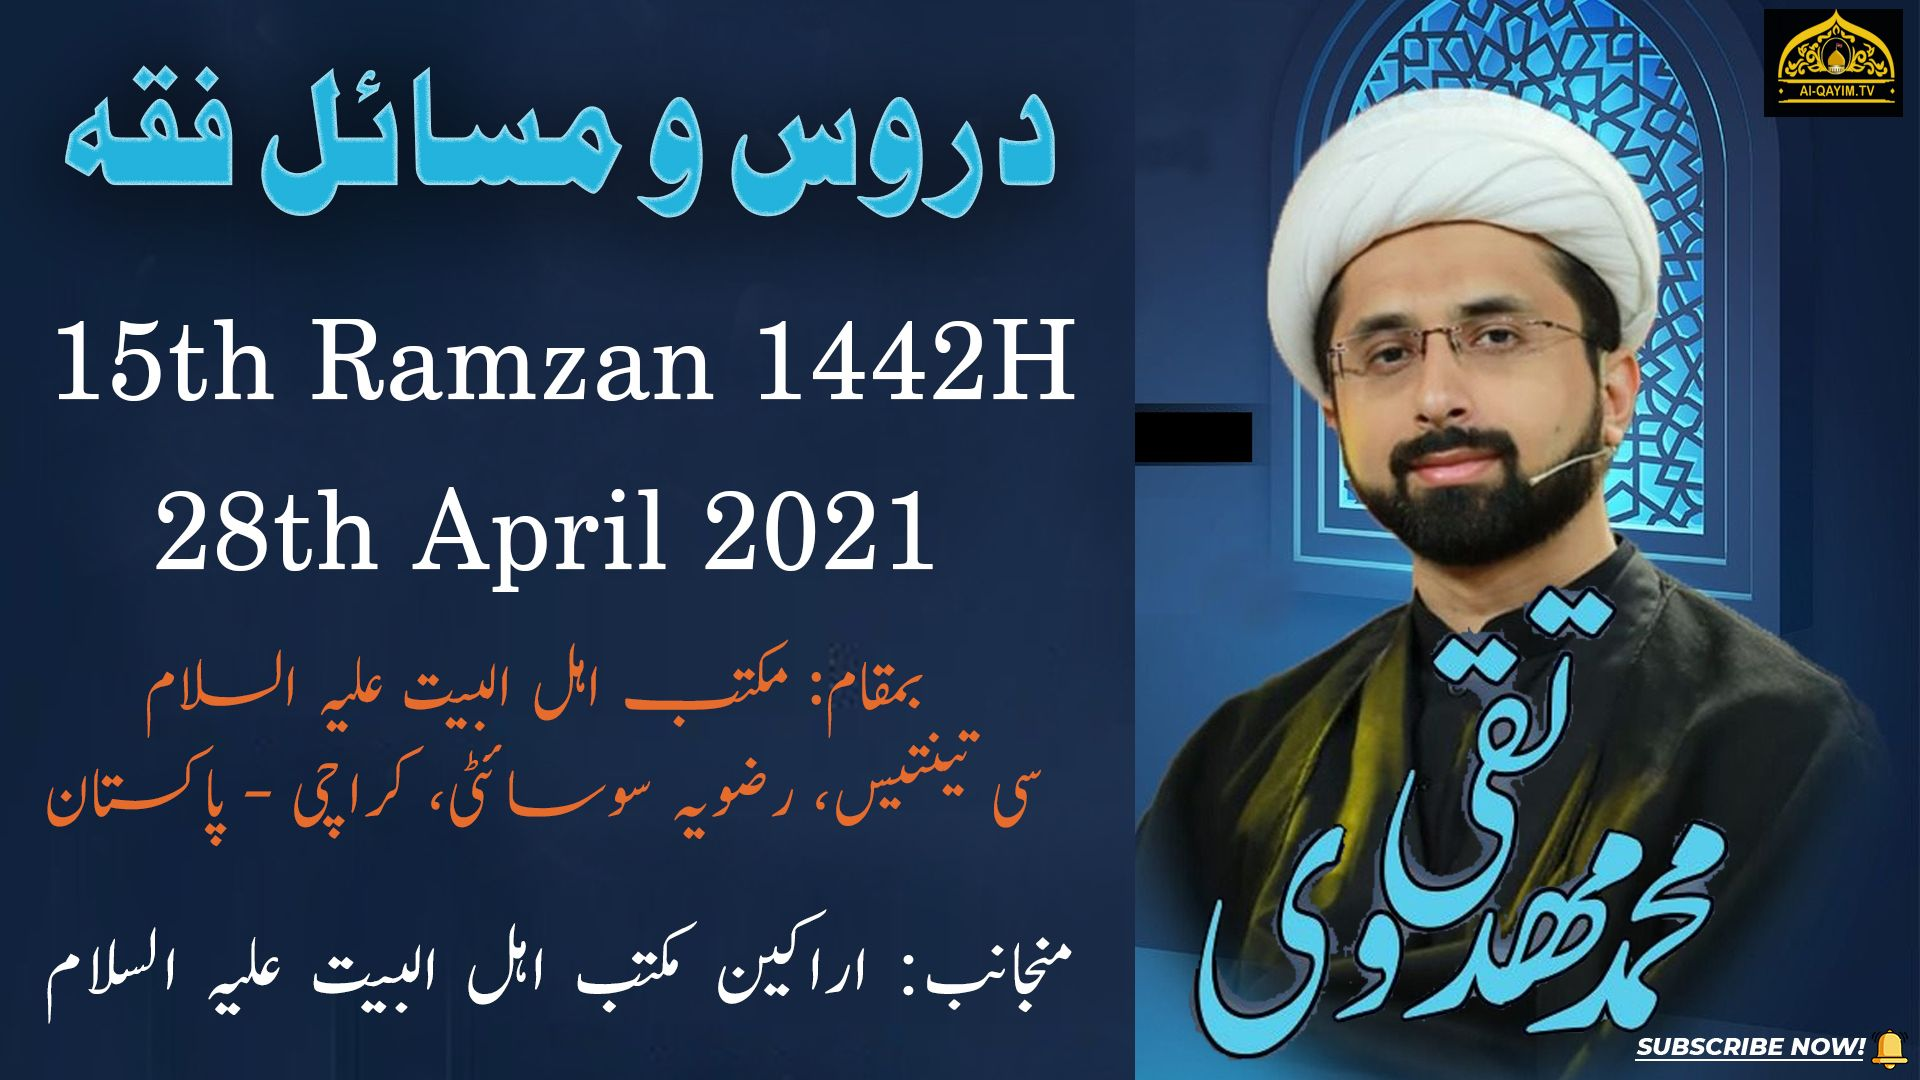 Moulana Muhammad Taqi Mehdavi | Dars Wo Masail Fiqae | 15th Ramzan 2021 | Maktab-e-Ahlebait, Karachi